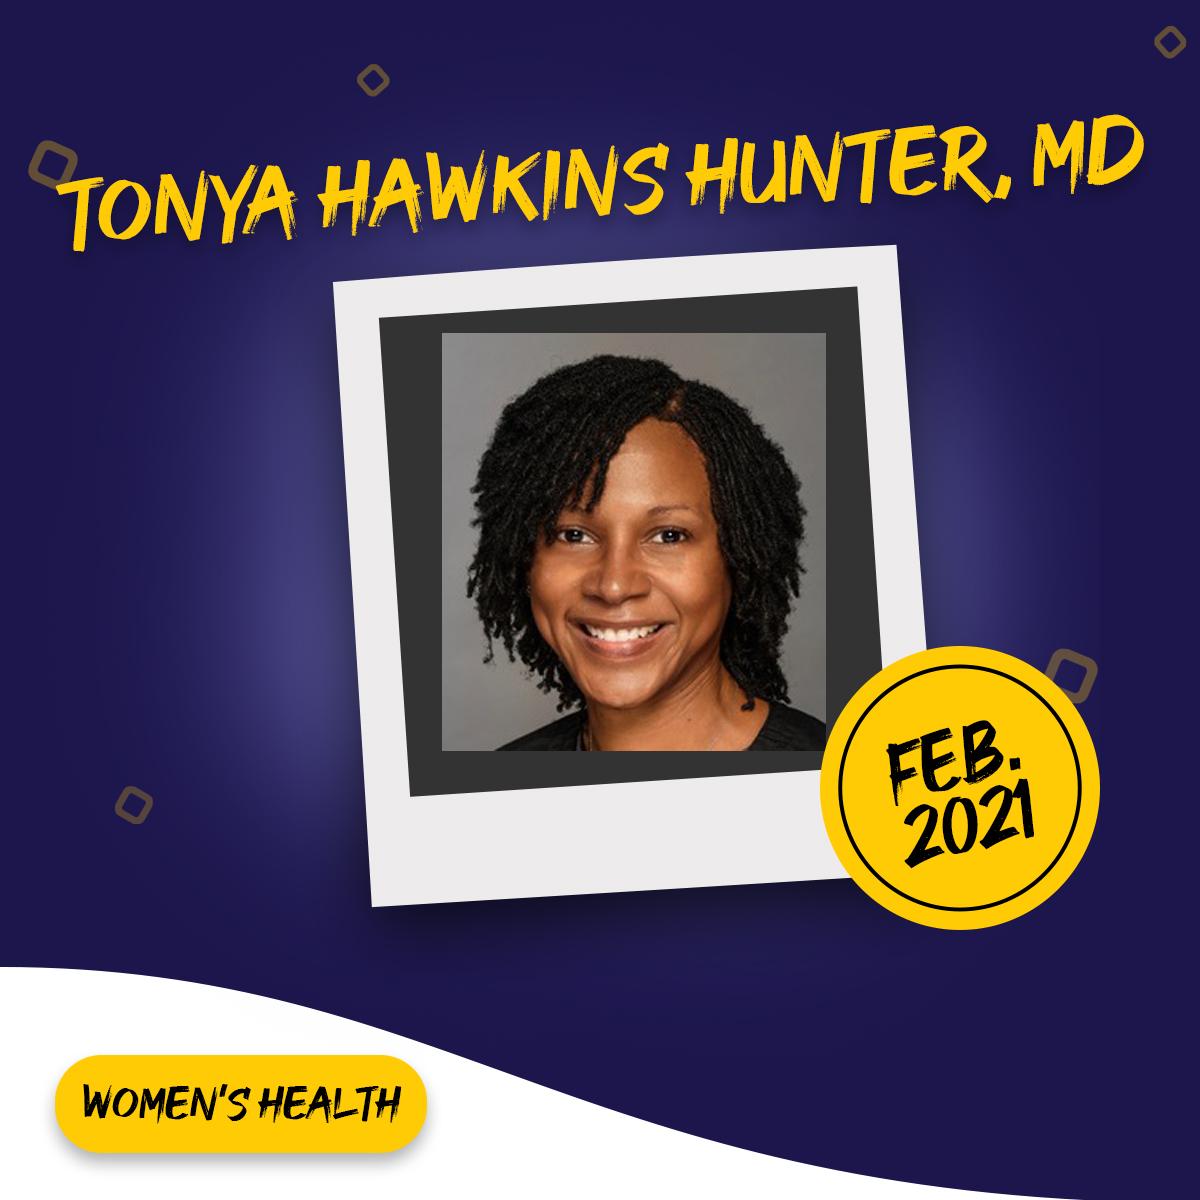 Women's Health – February 2021